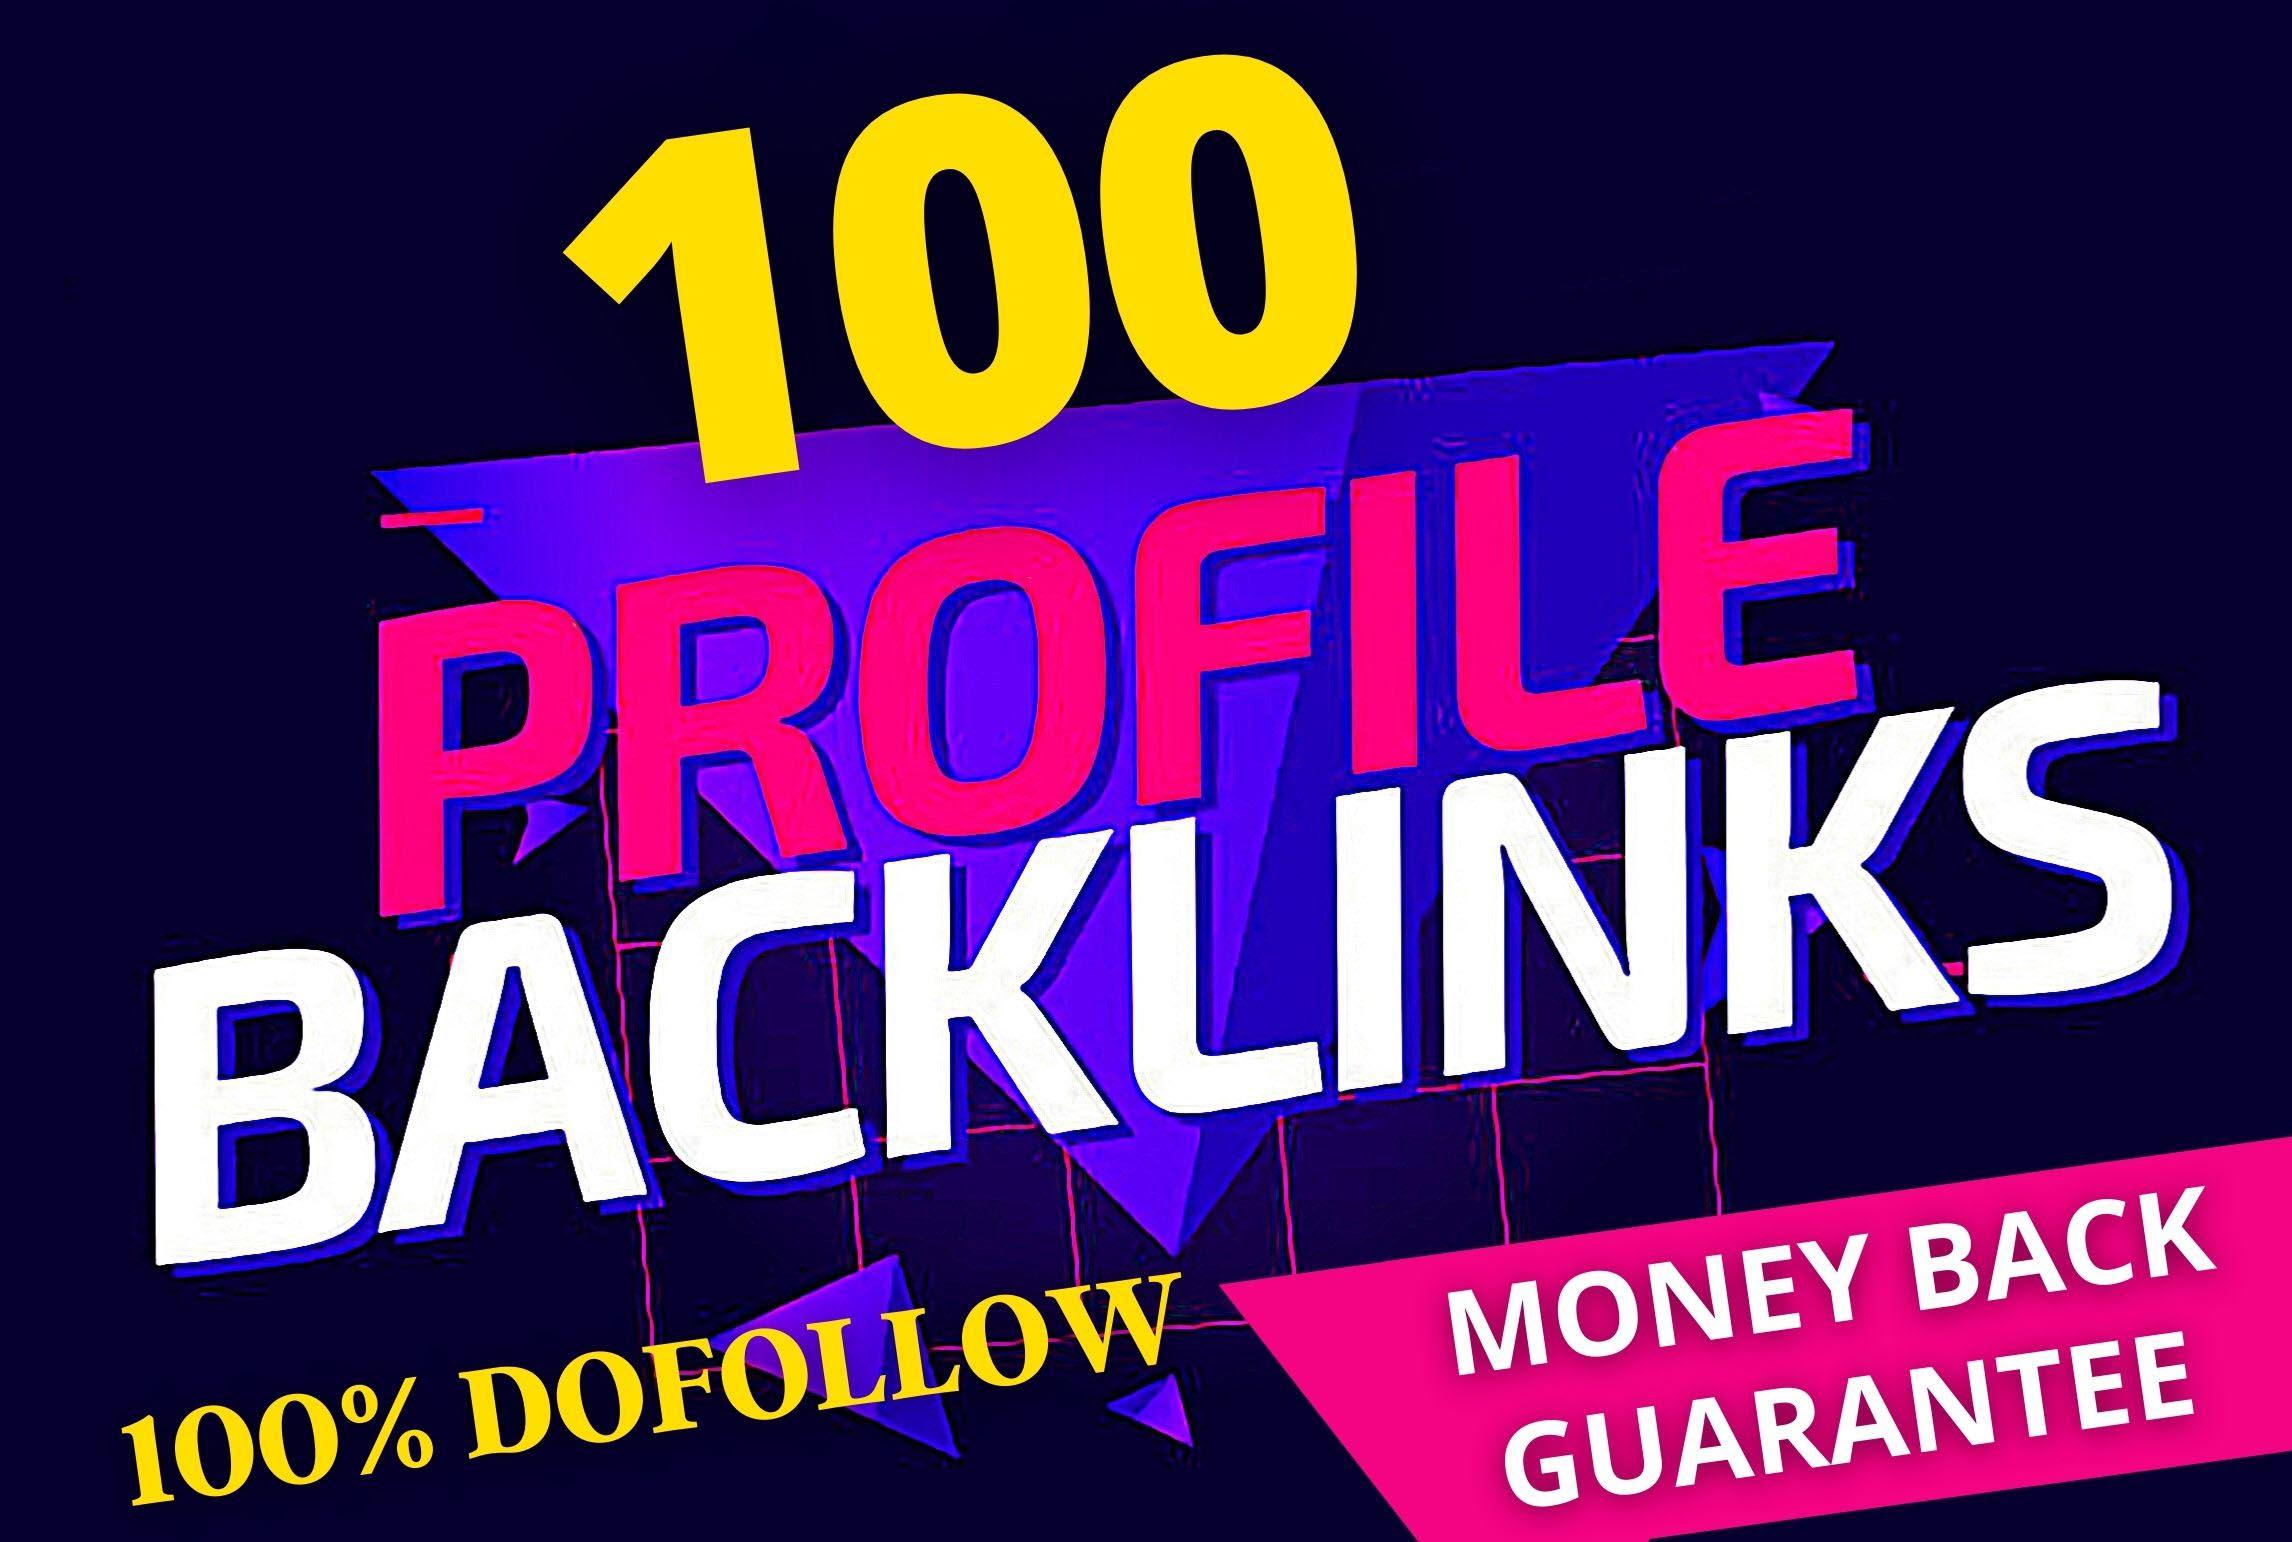 Hundred Parcent Dofollow 100 Profile Backlinks creations 80+DA PA Pr9 SEO Link building